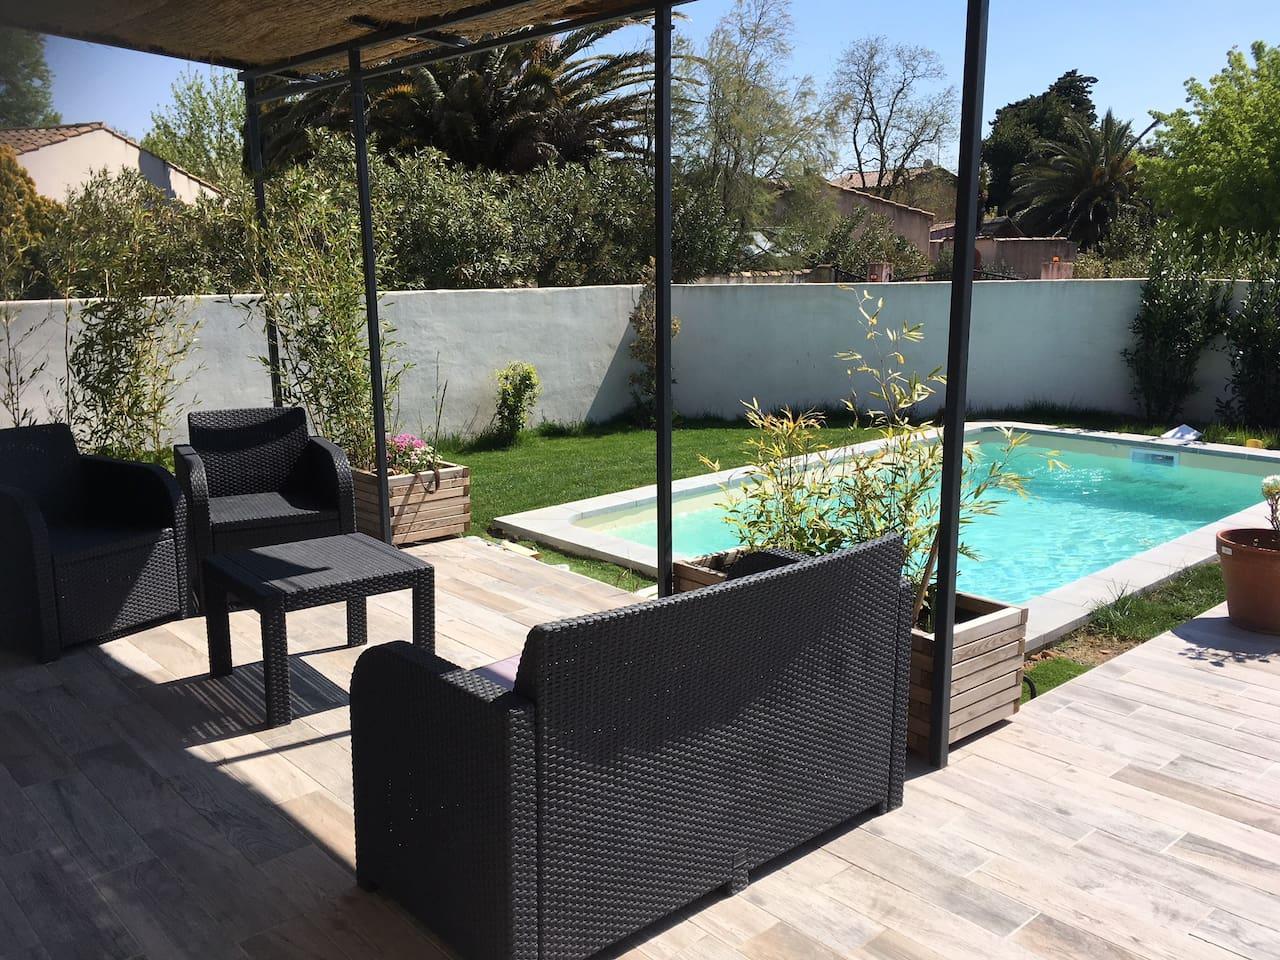 Terrasse 80m2 et piscine de 17,5 m² (1,40m de profondeur)